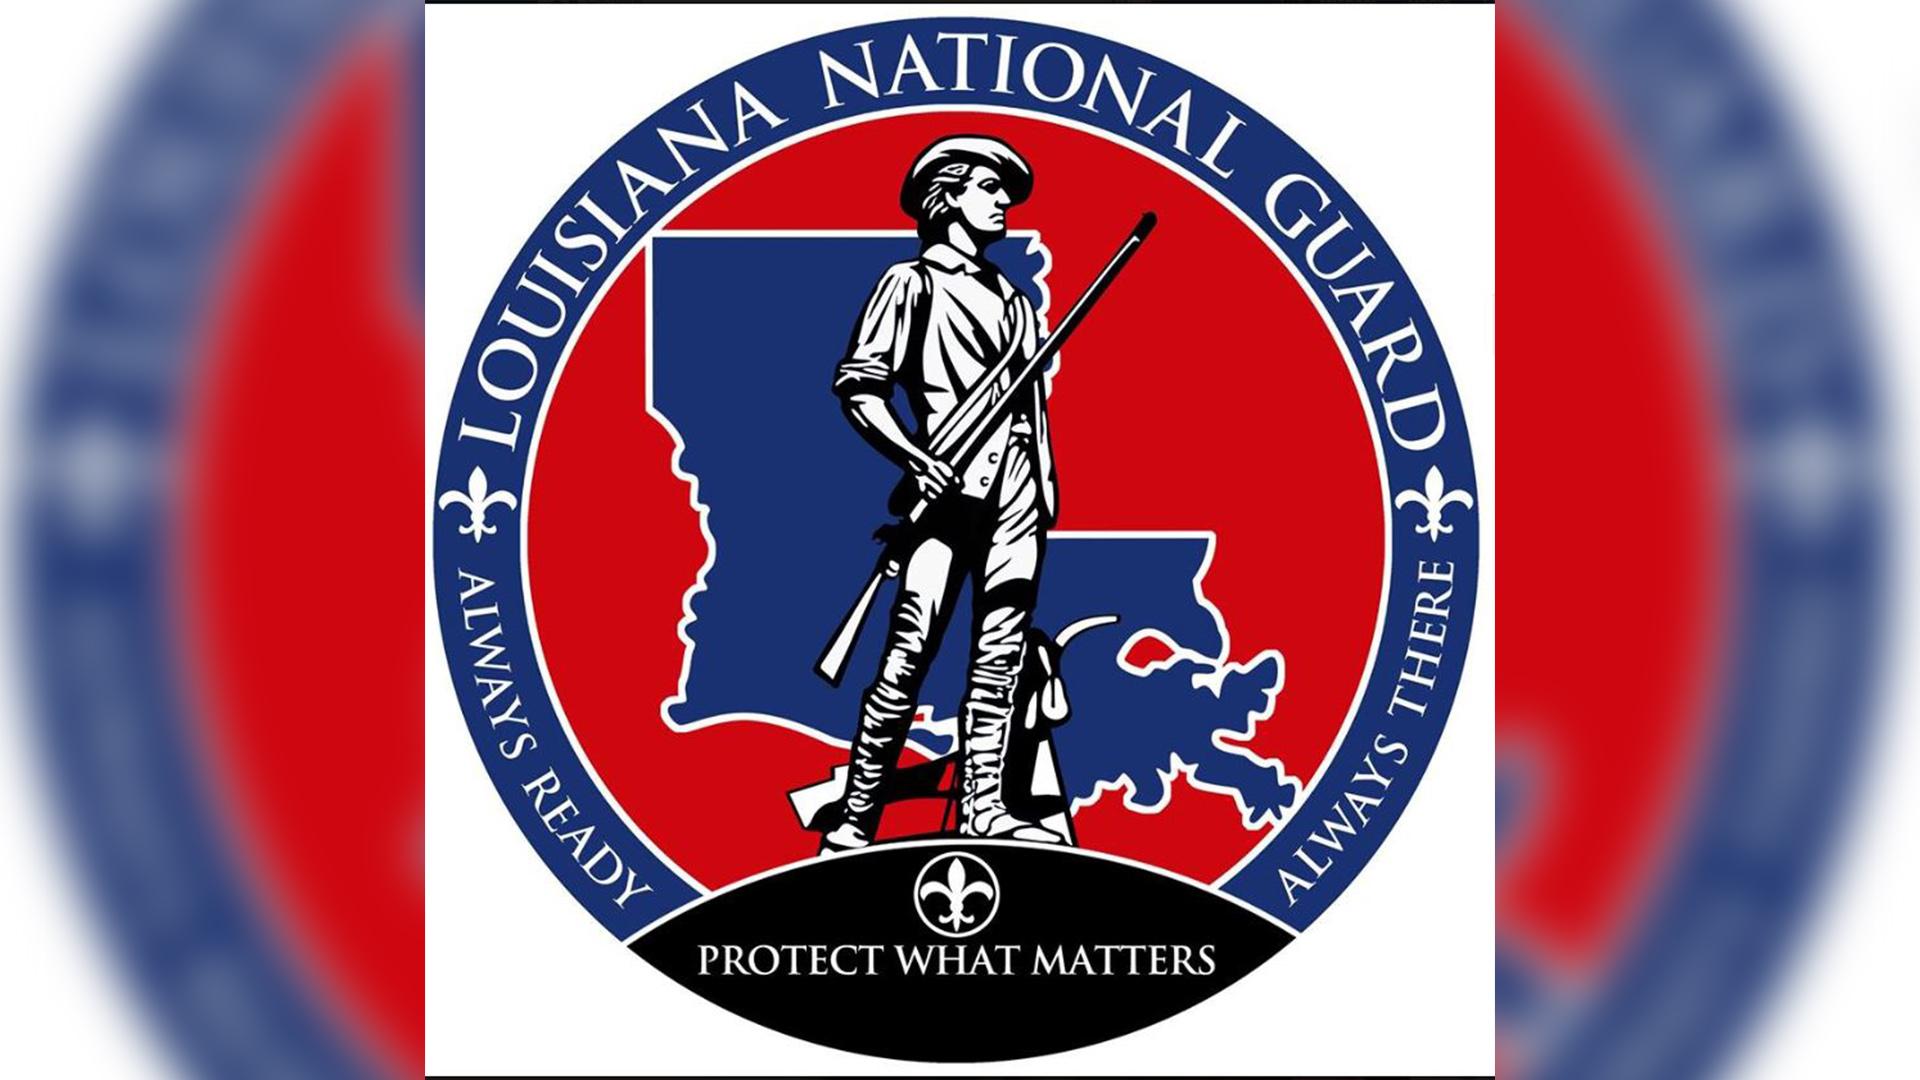 Louisiana National Guard_1556020966812.JPG.jpg